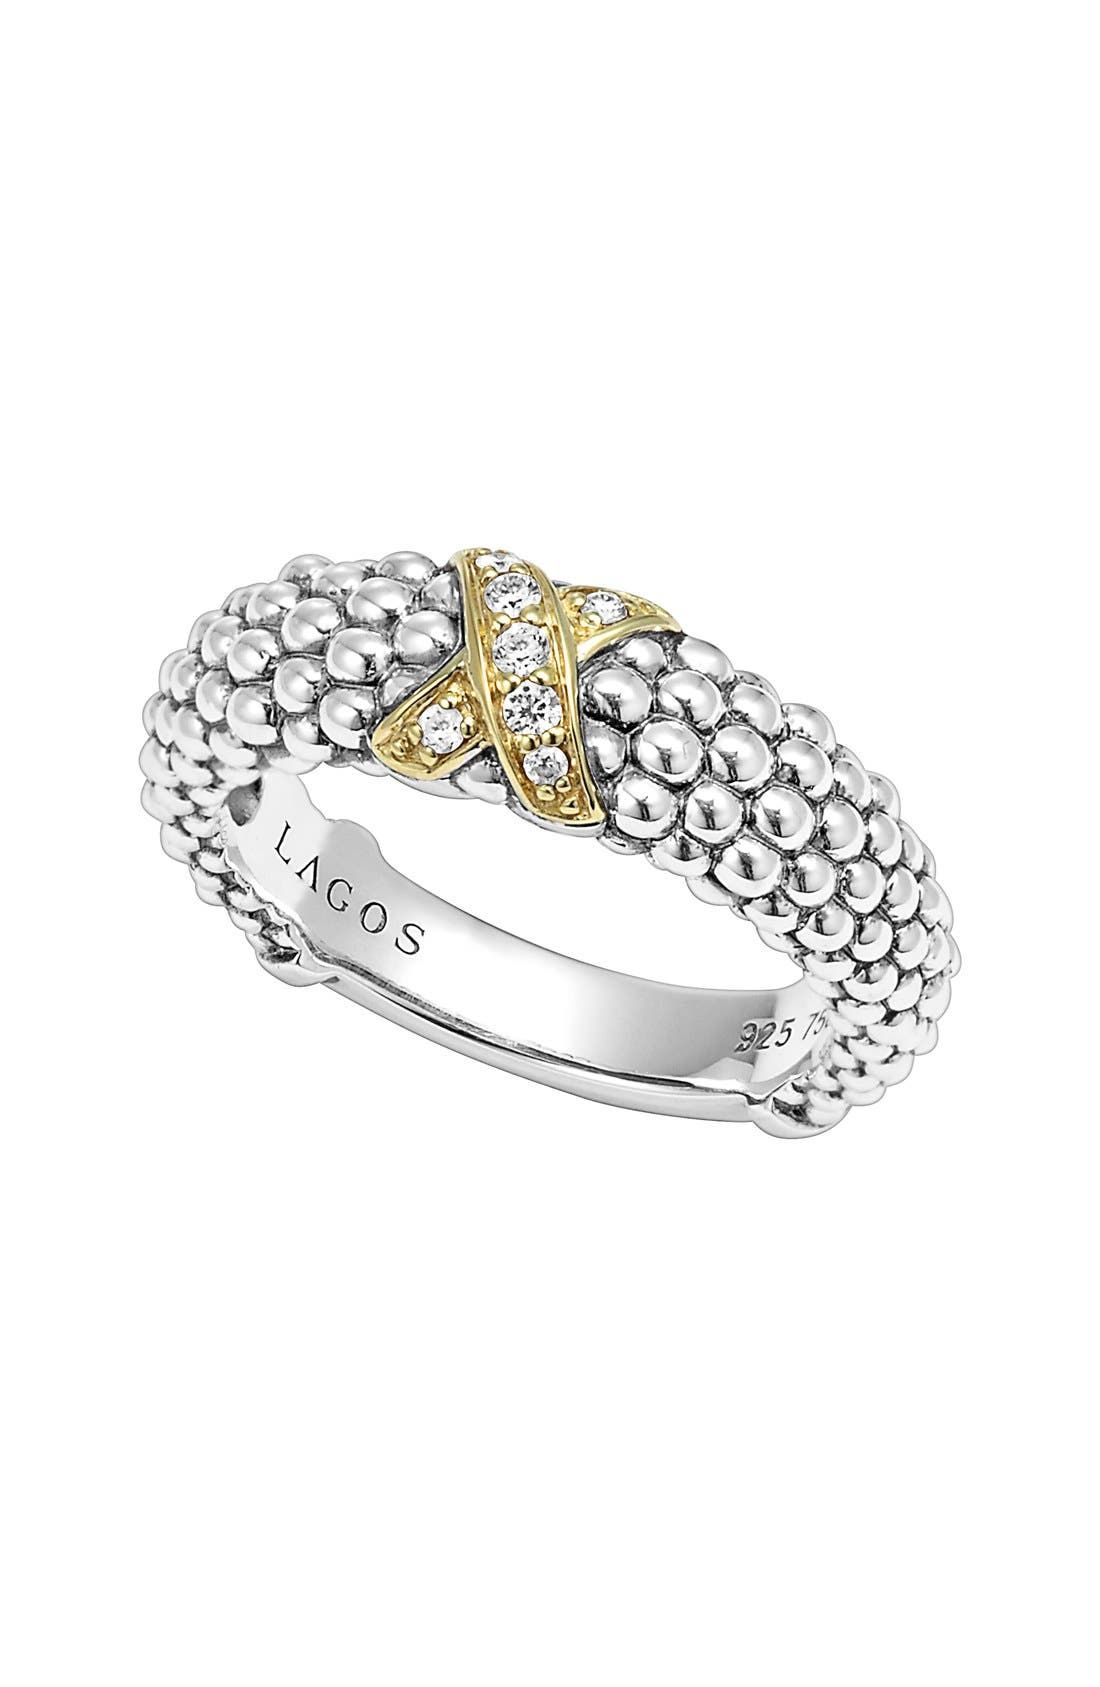 LAGOS 'X' Diamond & Caviar™' Two Tone Ring